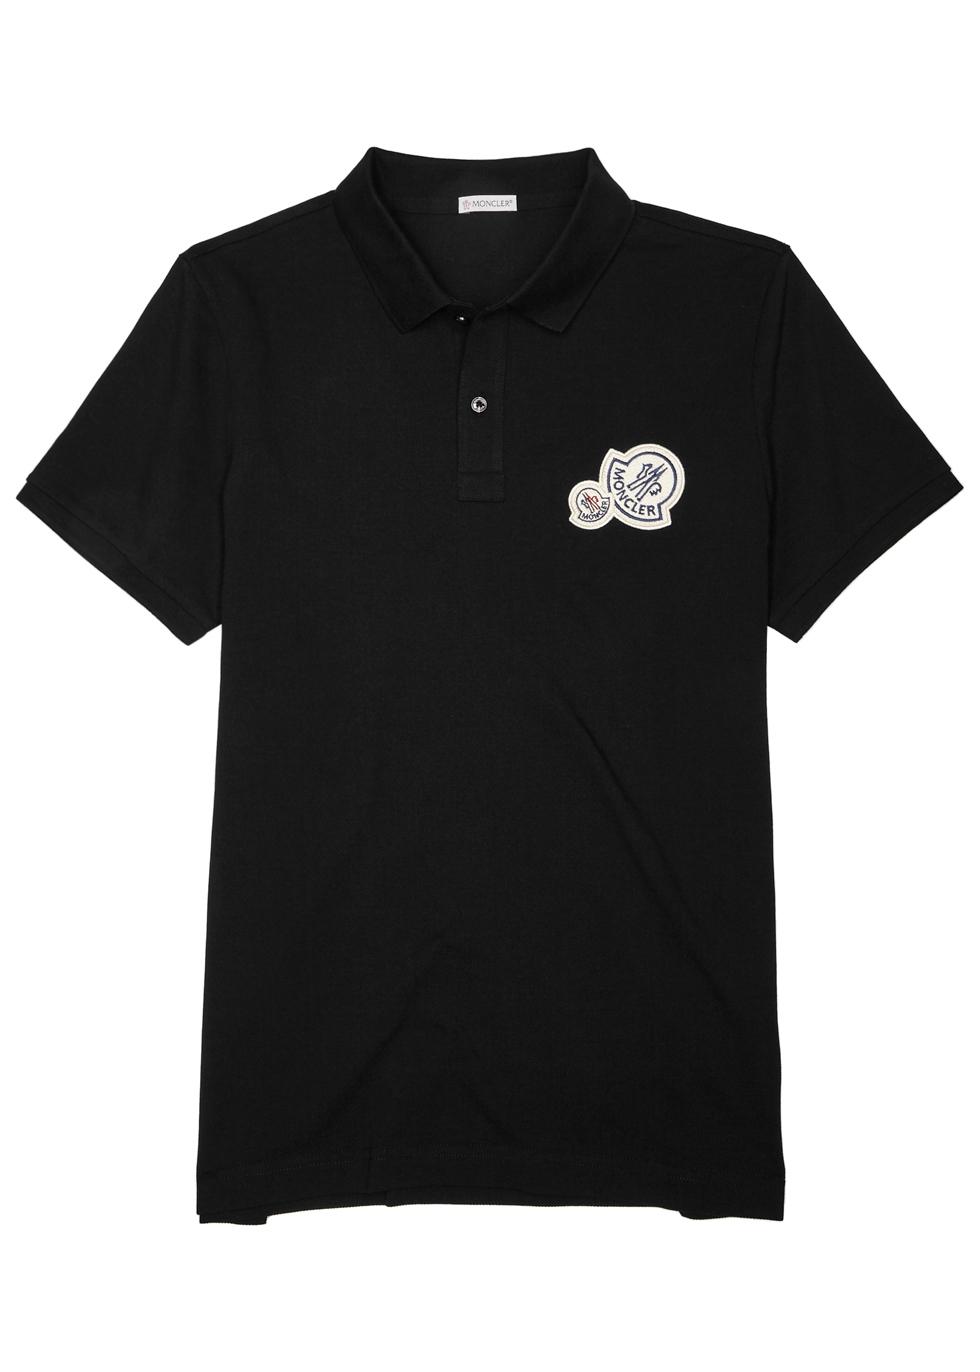 moncler black polo shirt